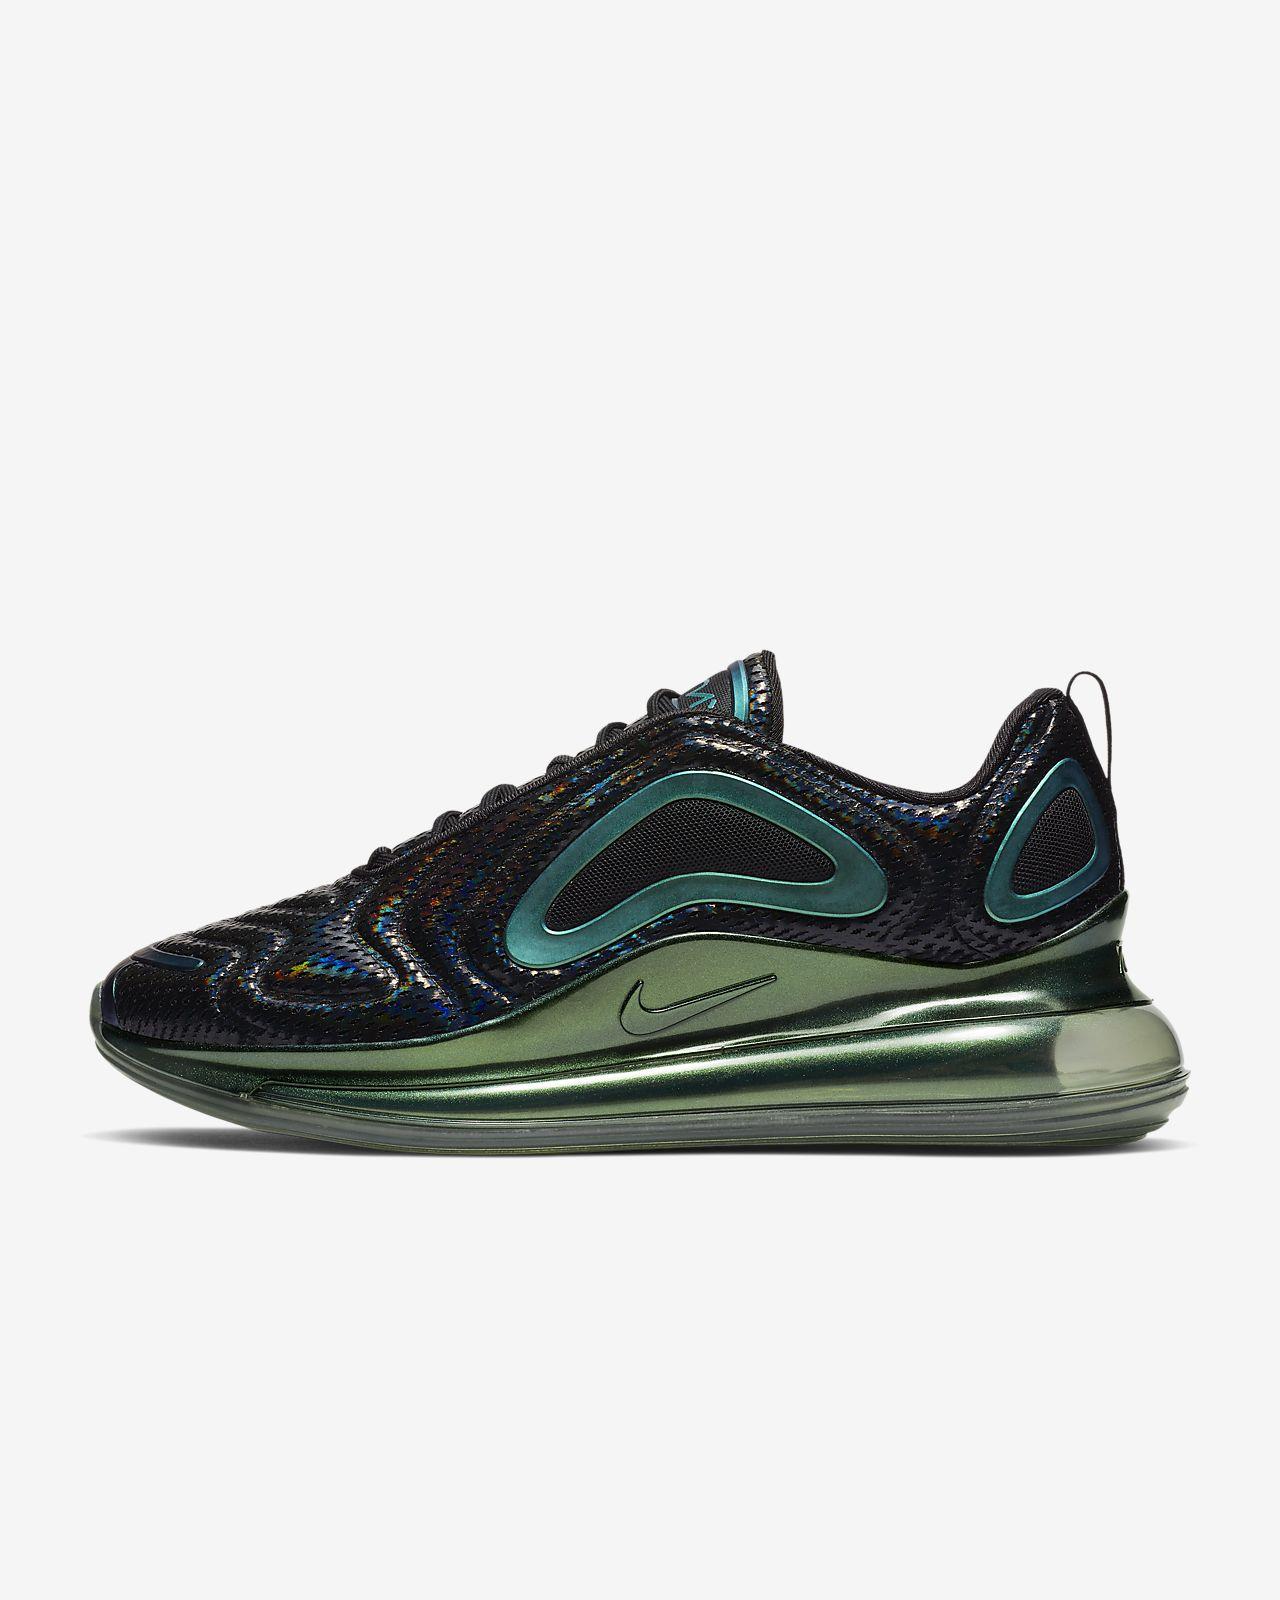 sports shoes a146b f948e ... Chaussure Nike Air Max 720 pour Homme